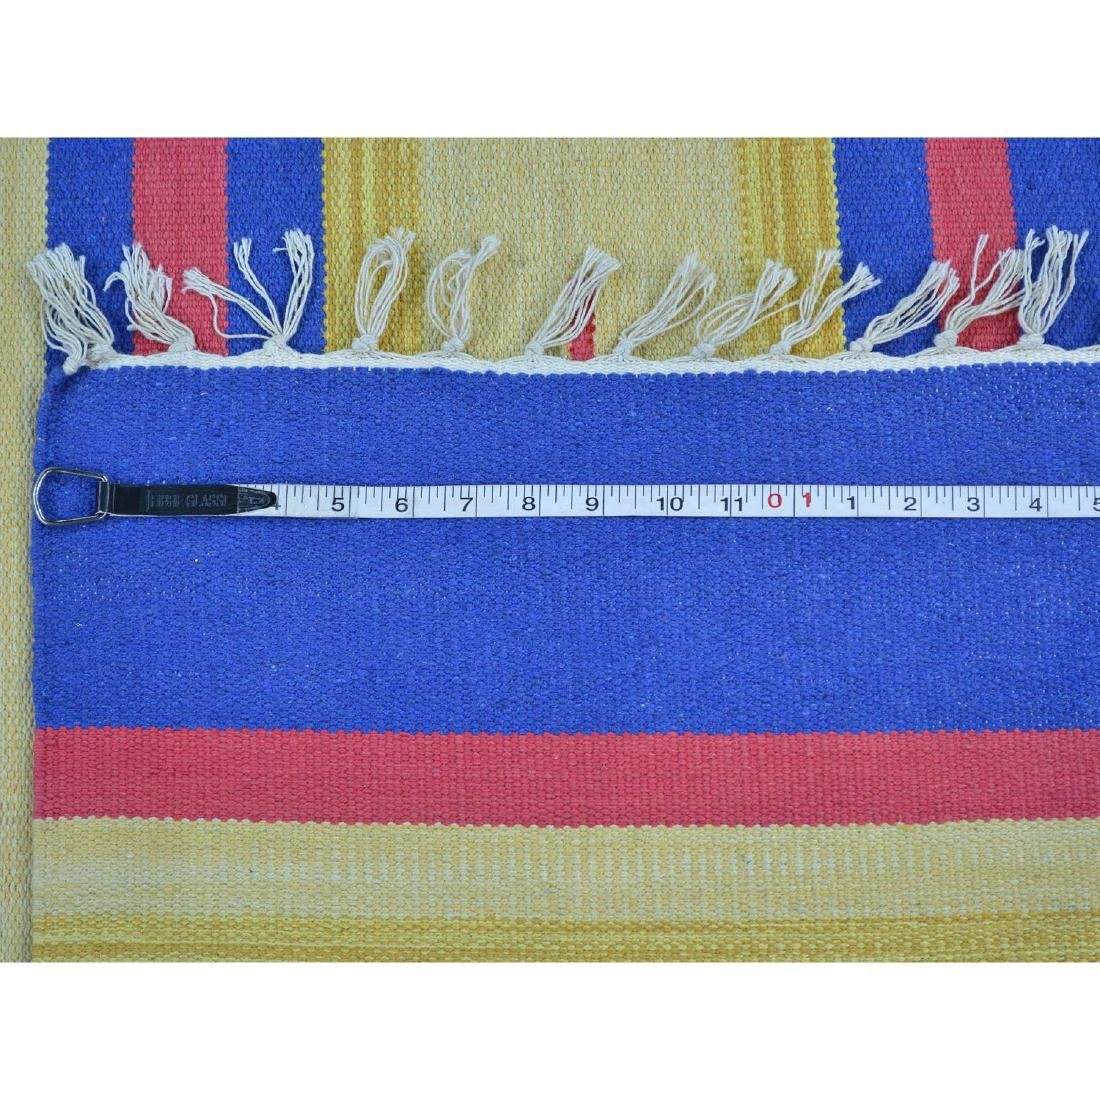 Square Navajo Design Flat Weave Hand Woven Killim Rug - 5